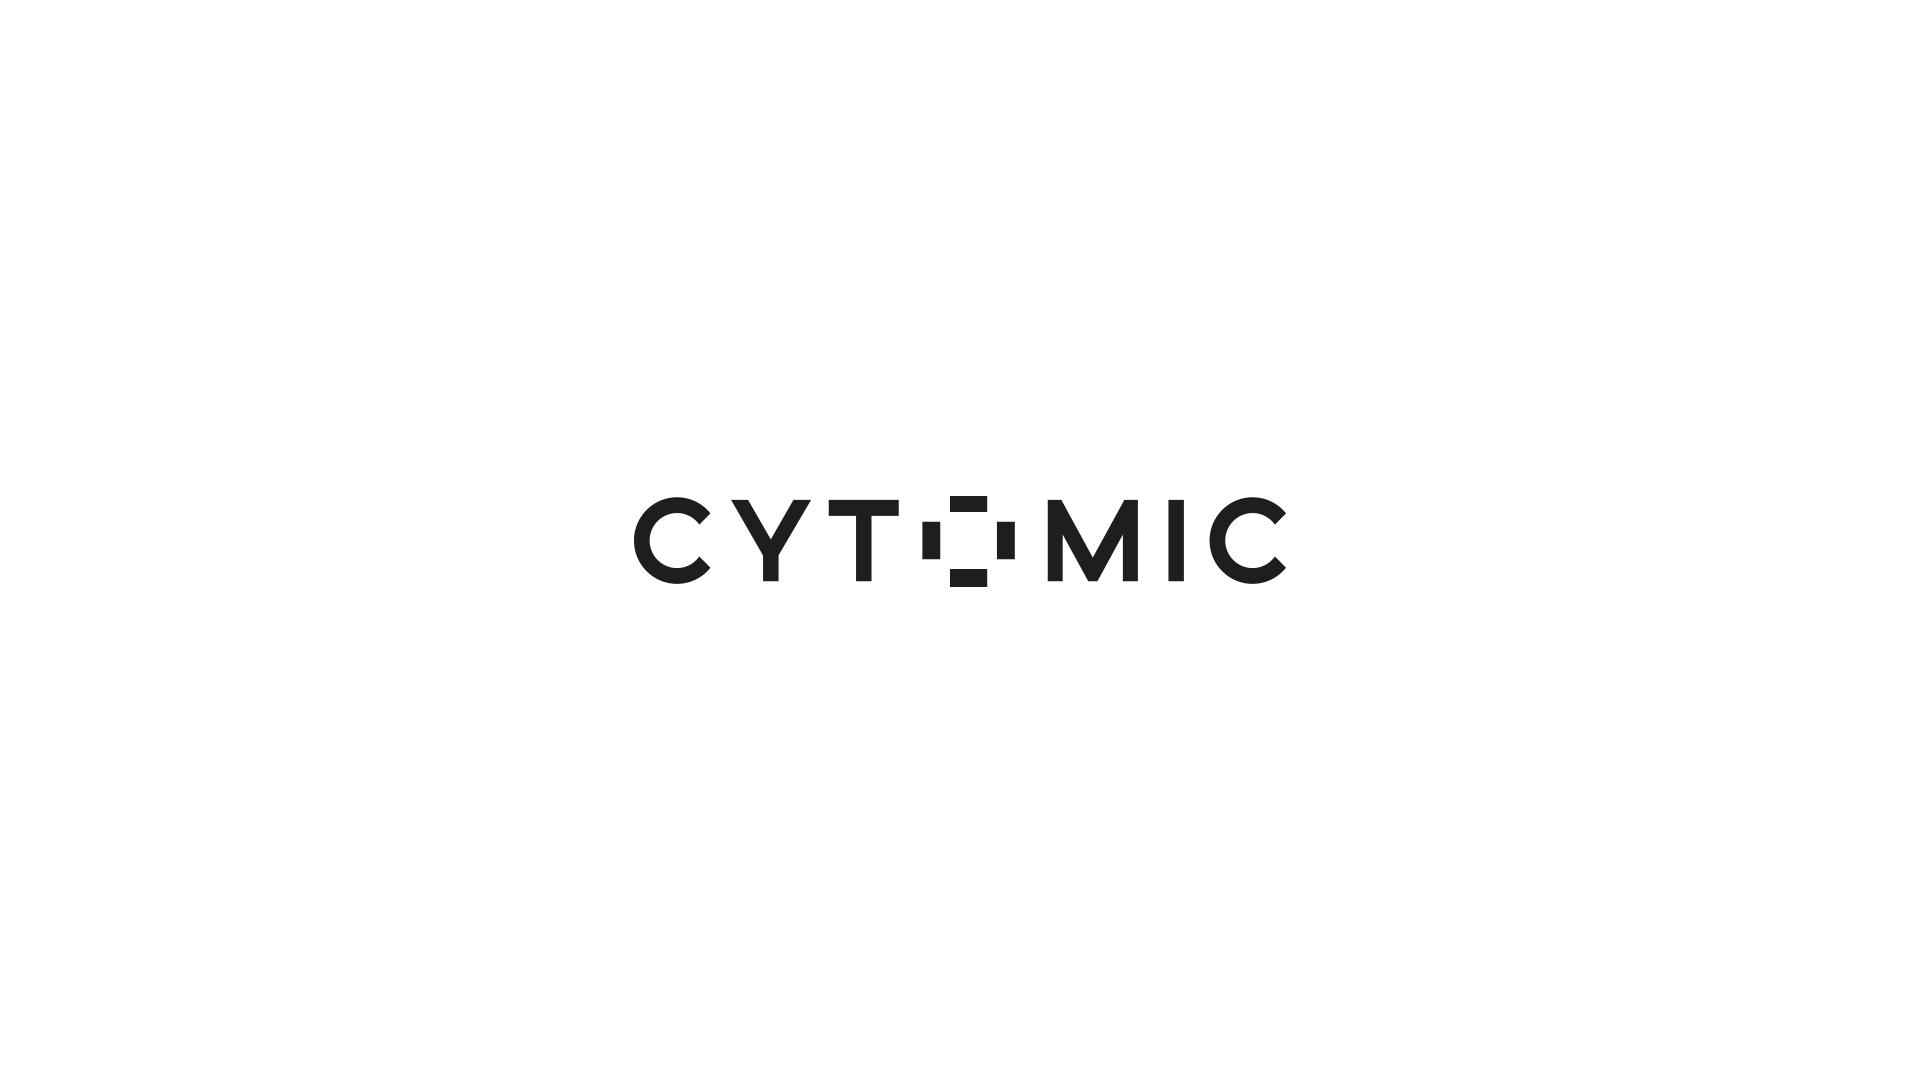 Cytomic Branding by The Woork Co